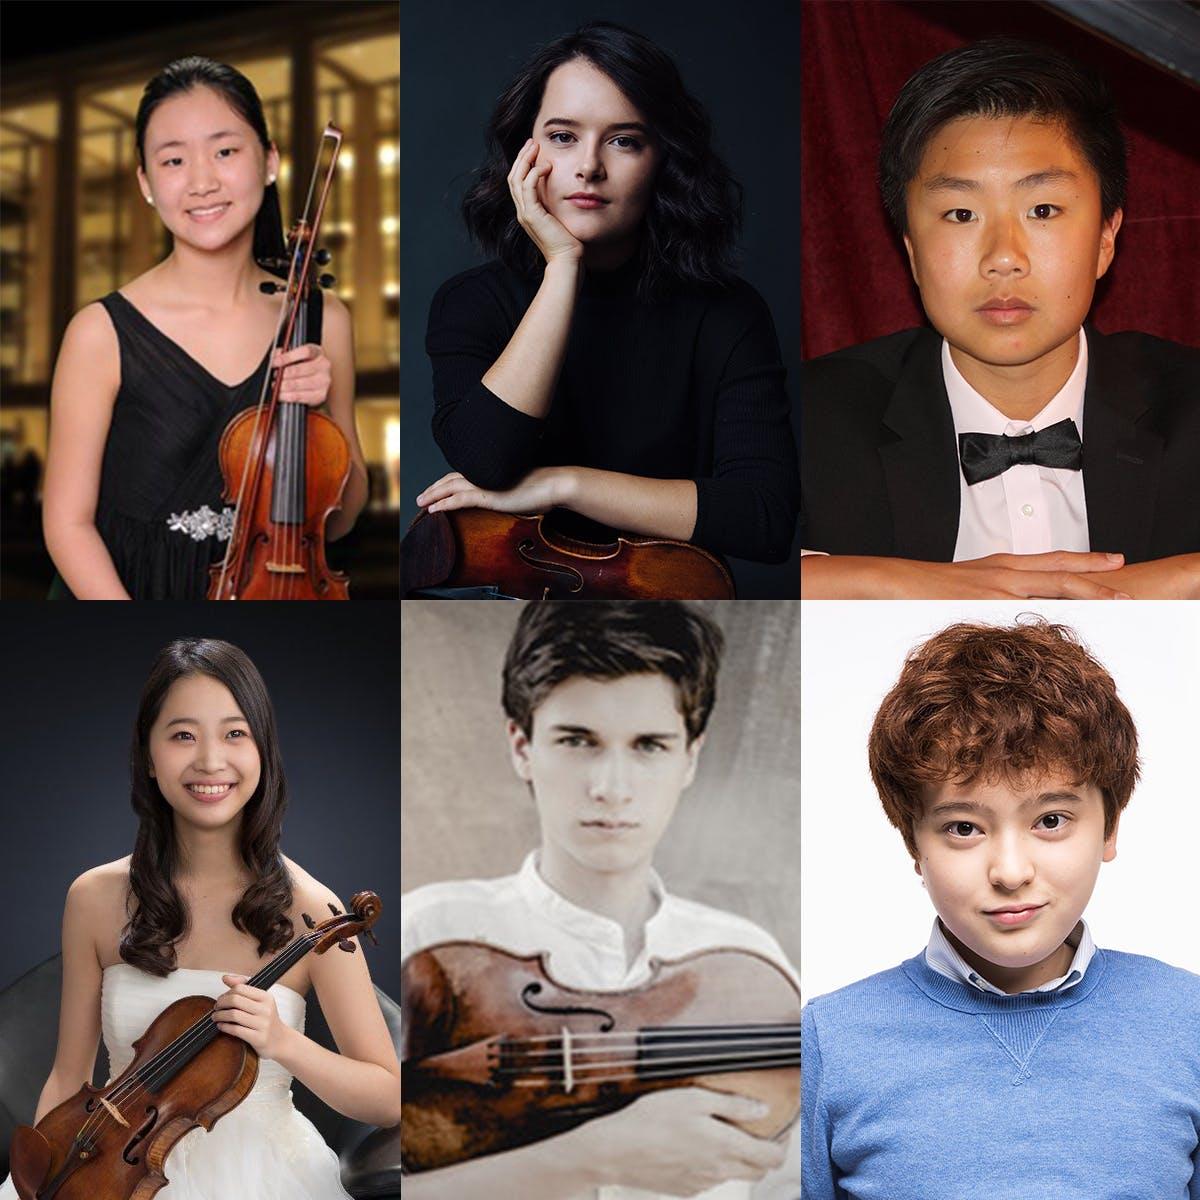 IMPORT 2018 New York International Artists Competition Winners Showcase; Daniel Tan, Piano, at Carnegie Hall